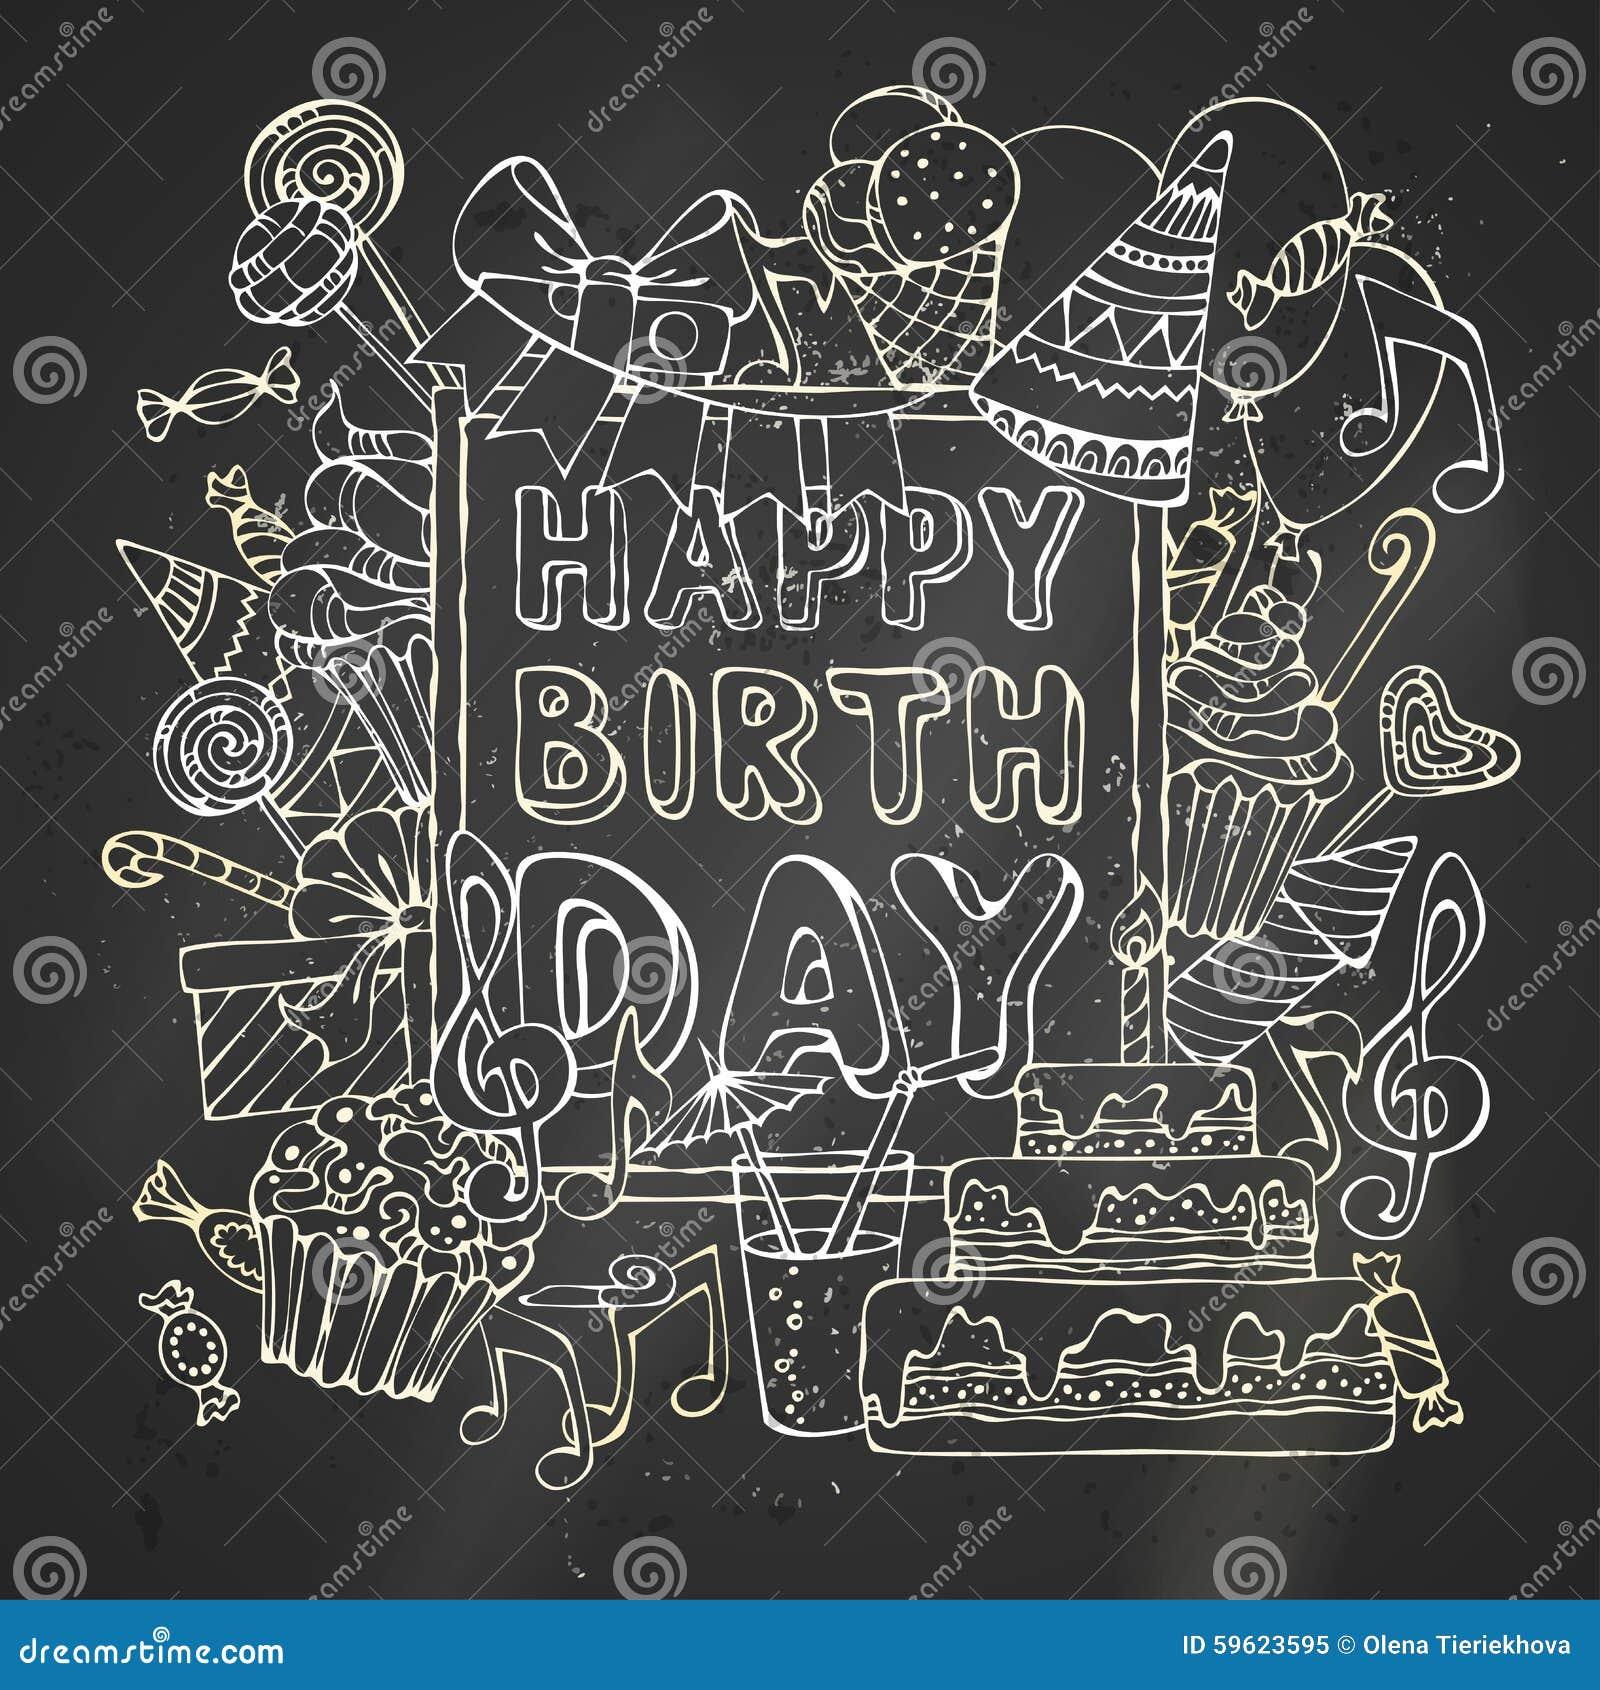 Chalk Happy Birthday Card